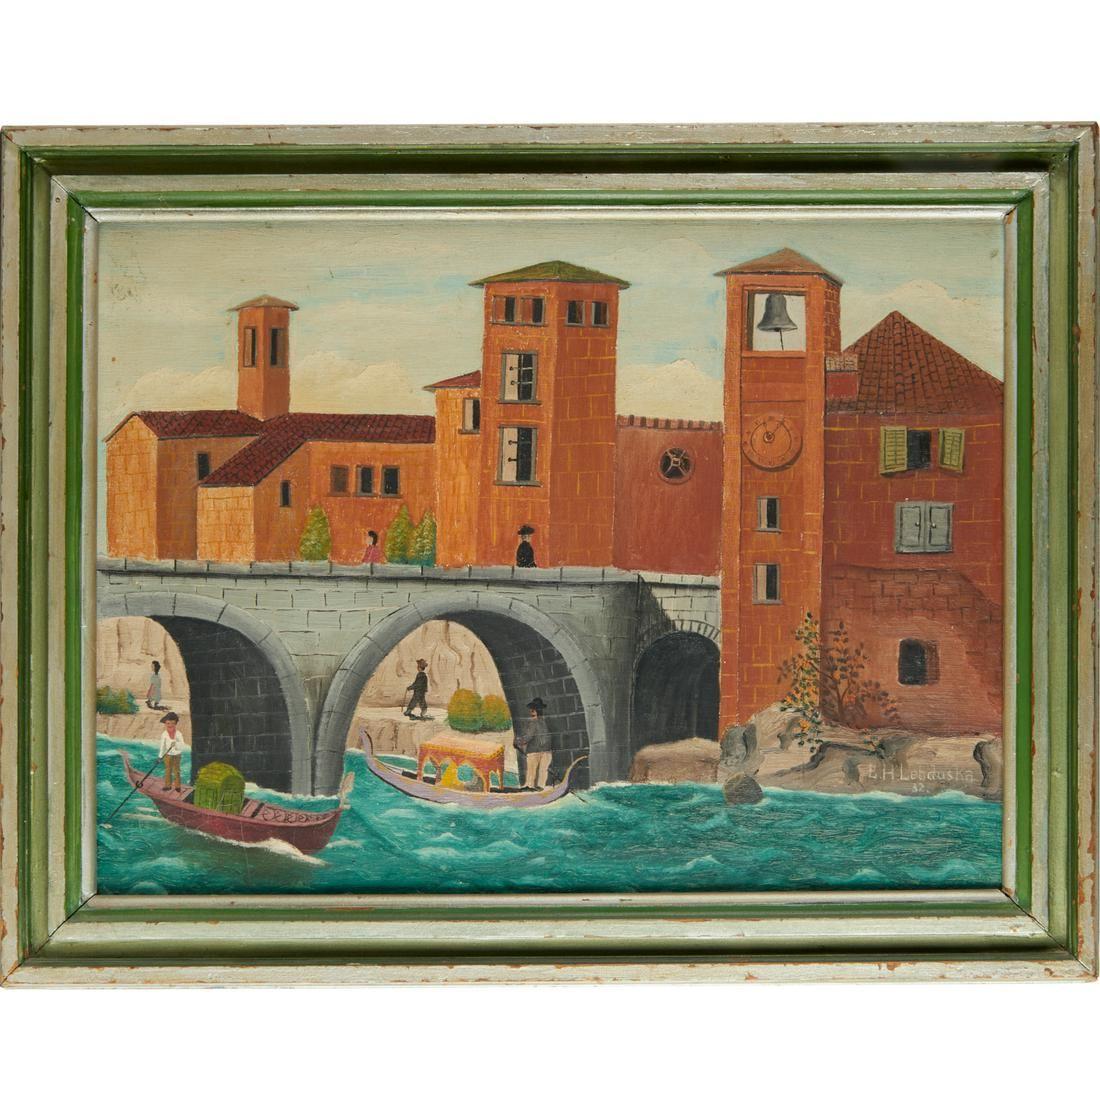 Lawrence Lebduska, oil on canvas, 1932